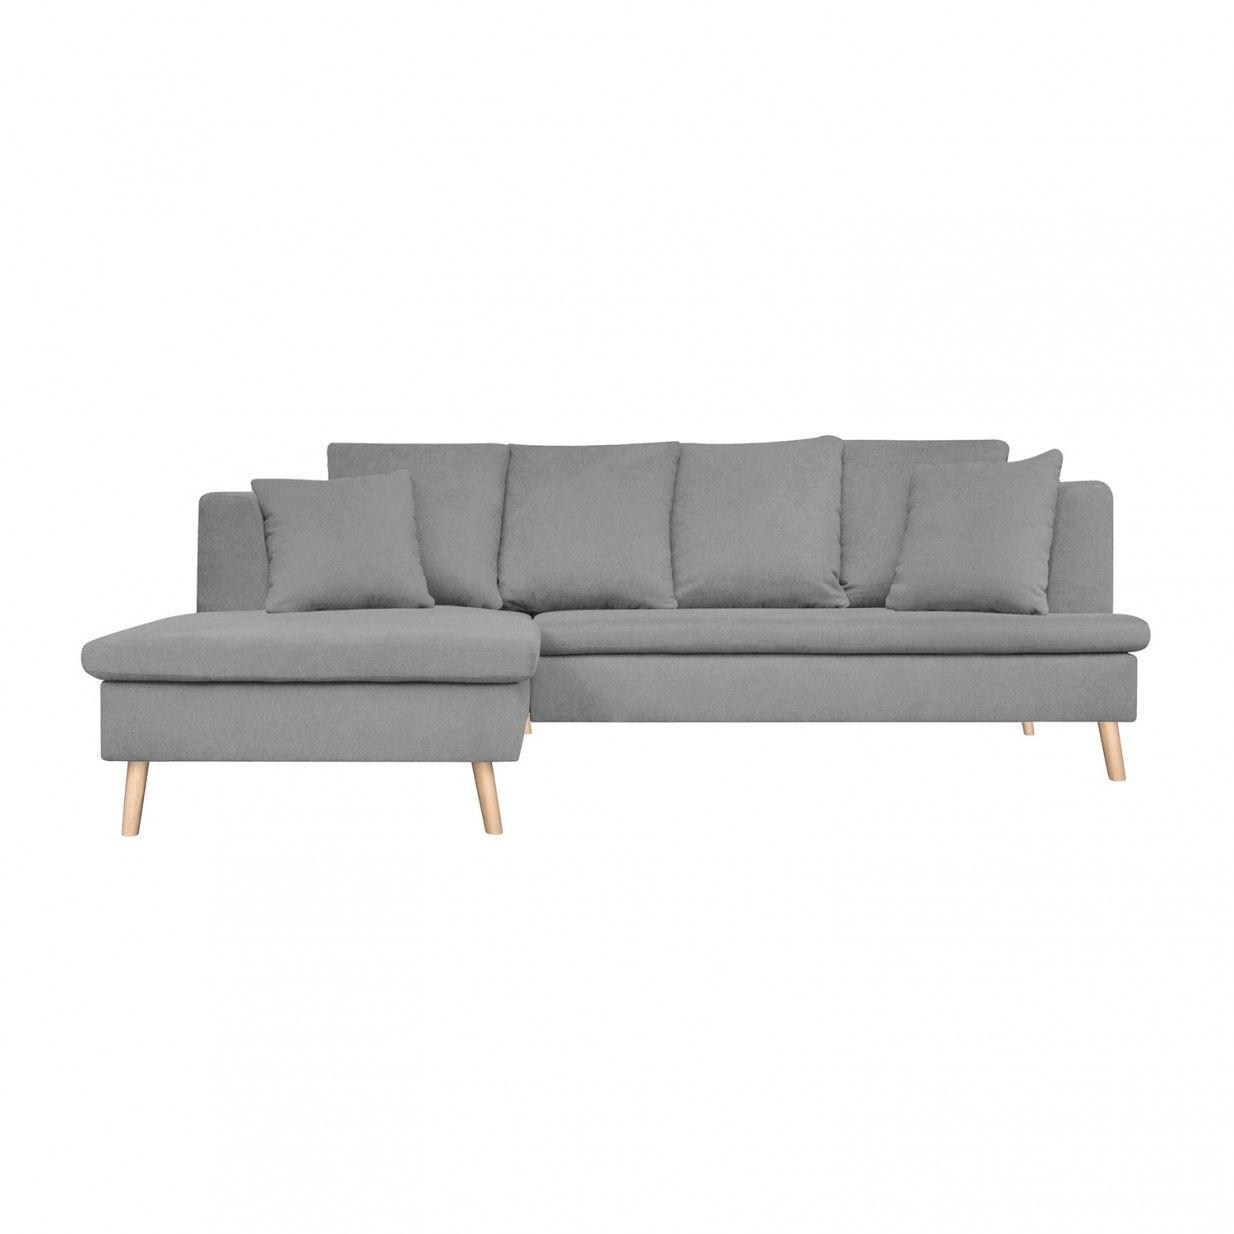 Design Newport Wohnzimmer GrauCosmopolitan Linkes Sofa hCtsQrd